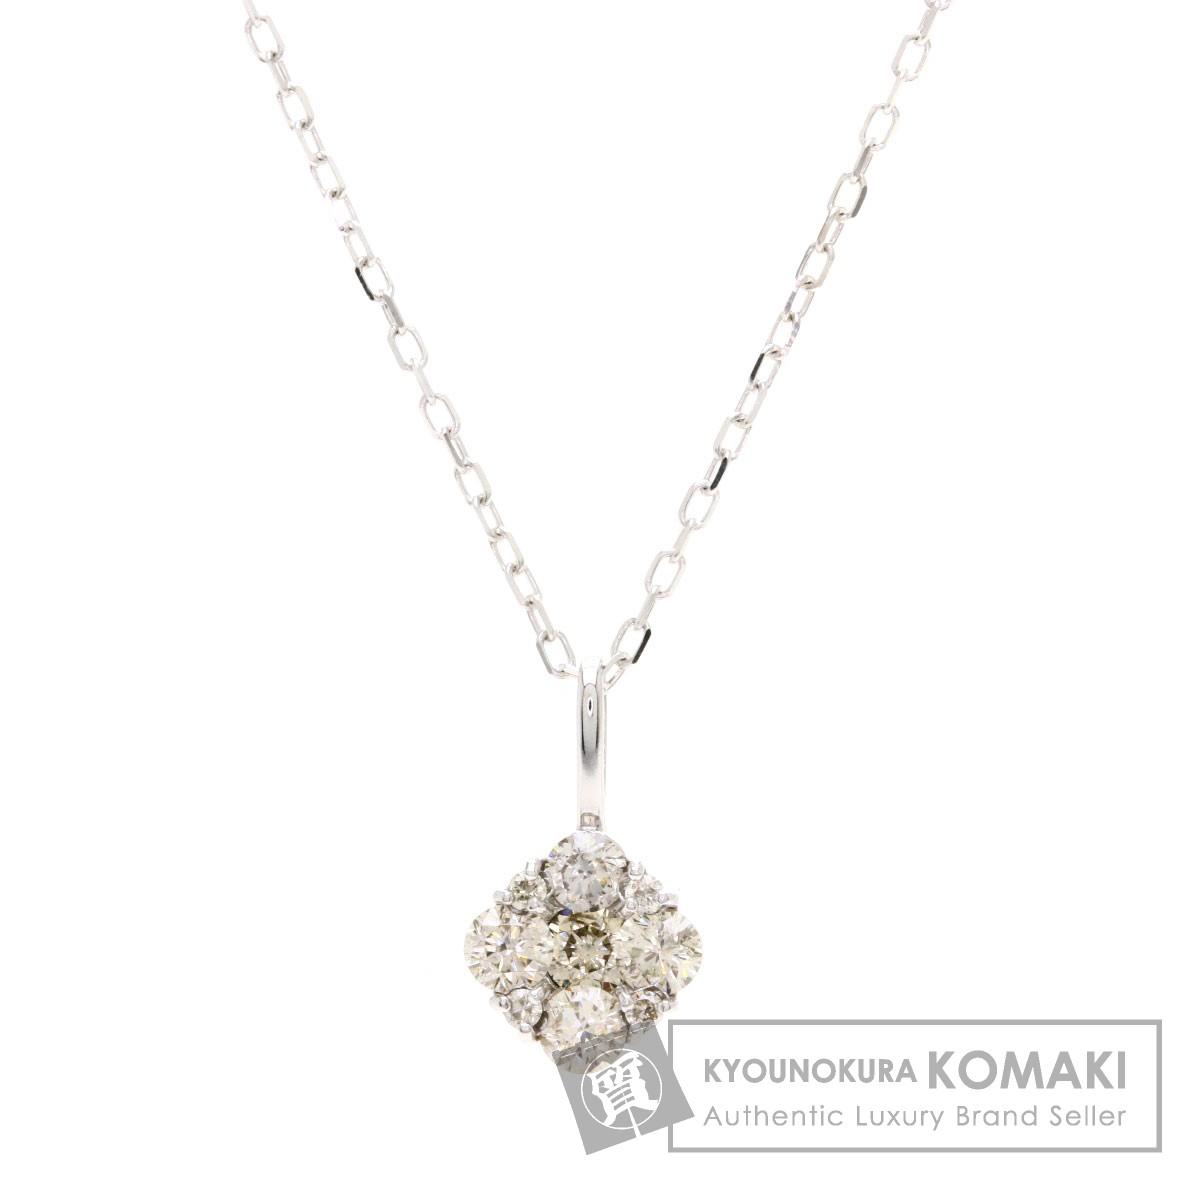 0.3ct ダイヤモンド ネックレス K18ホワイトゴールド 1.6g レディース 【中古】